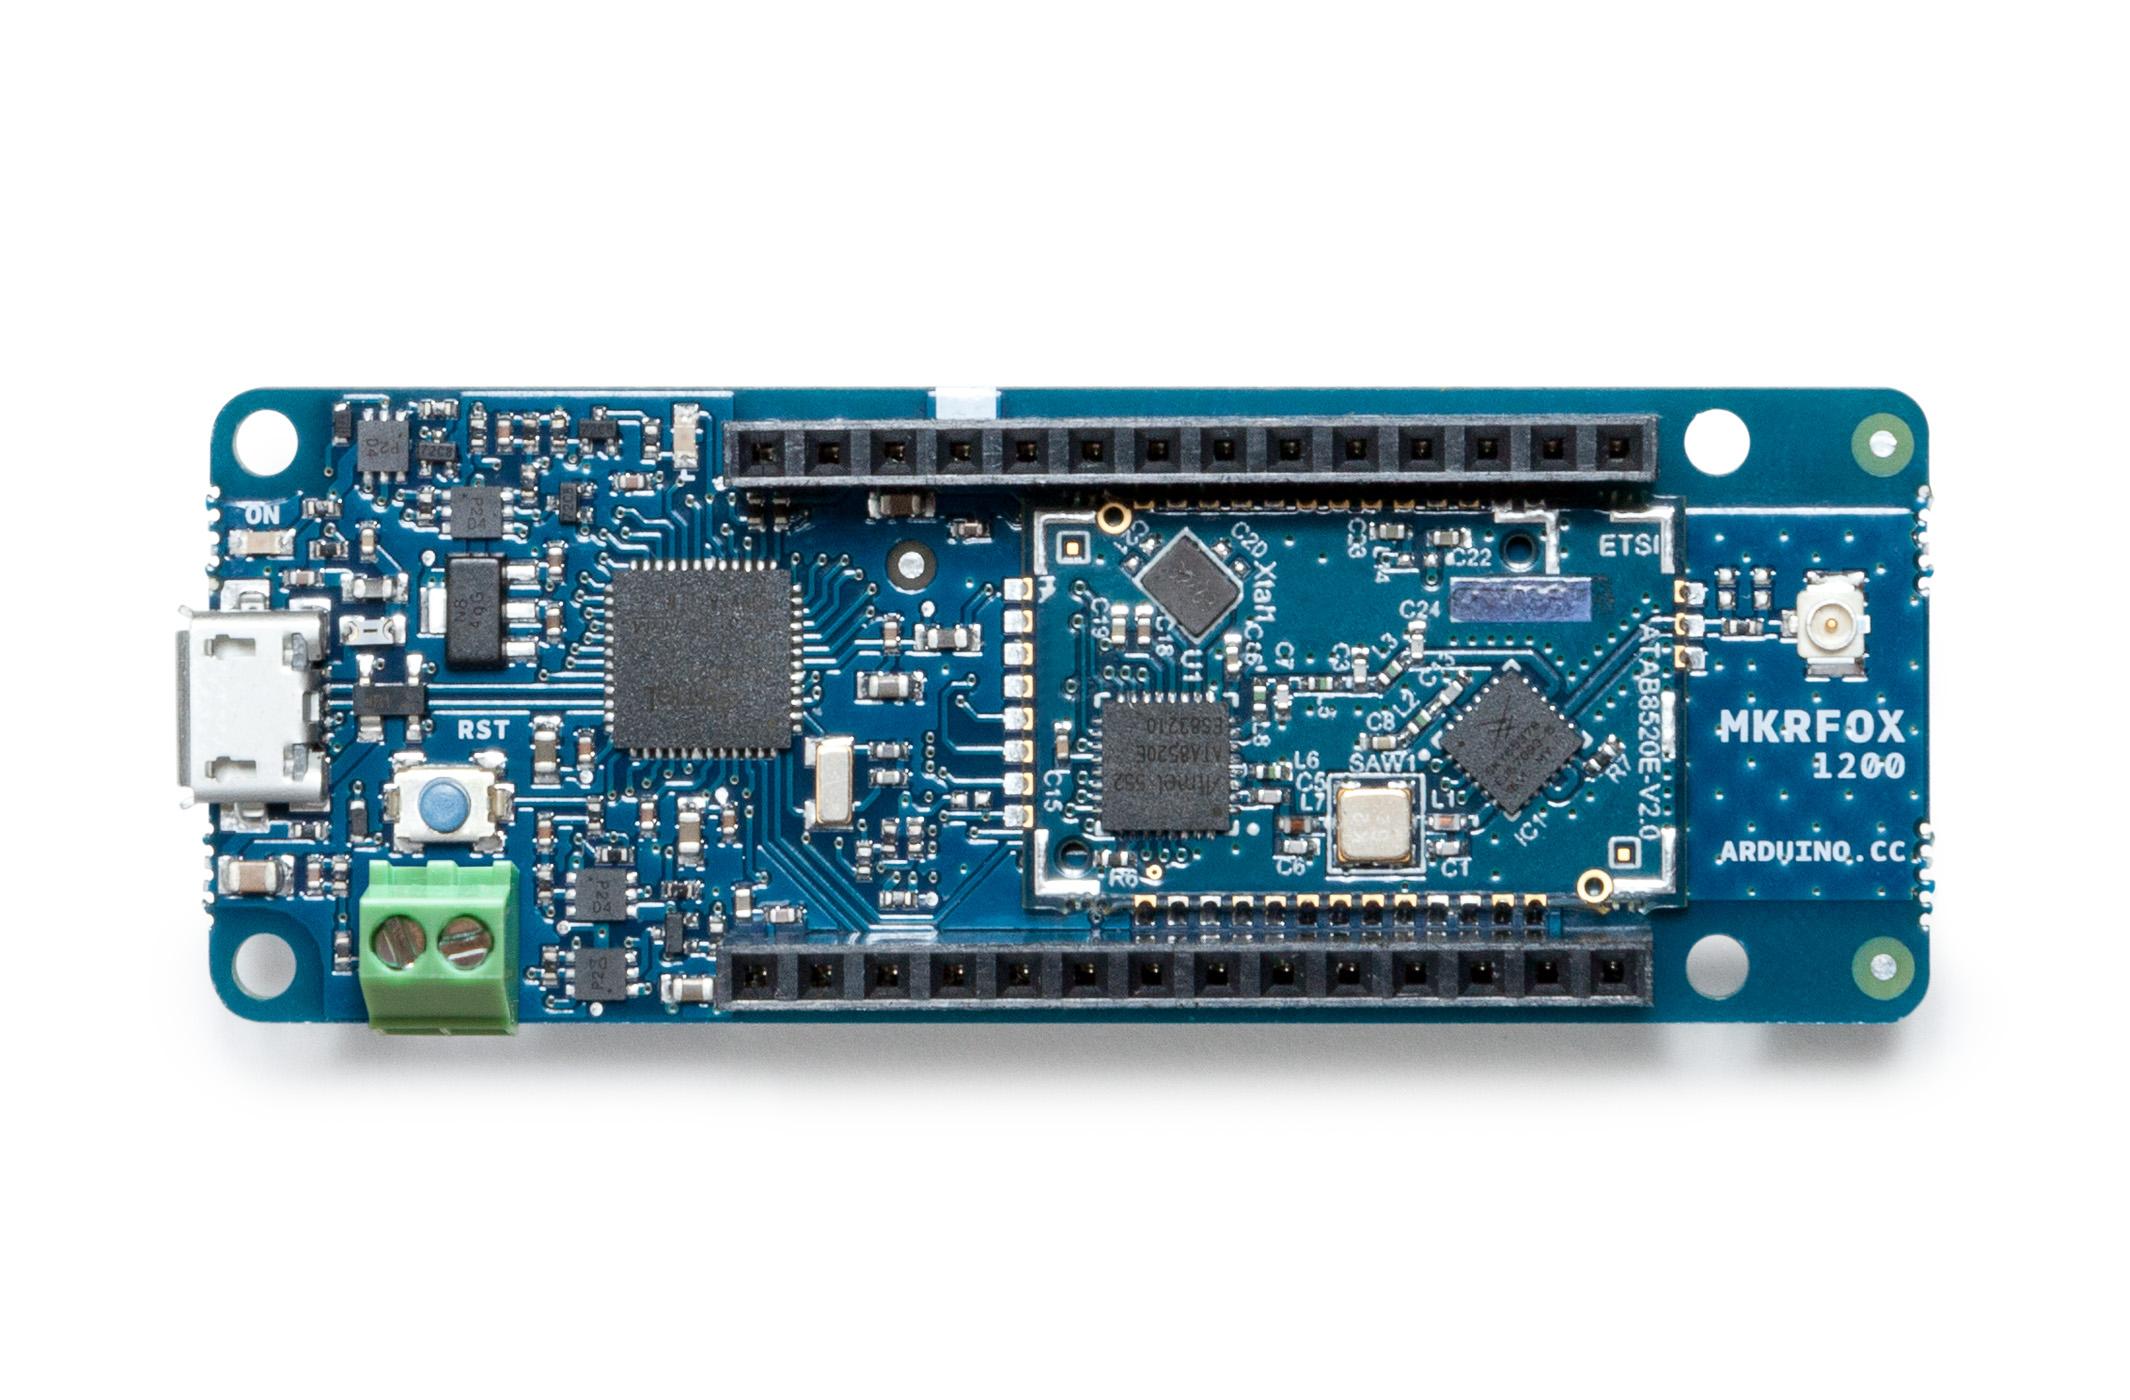 New arduino iot development board unveiled mkrfox